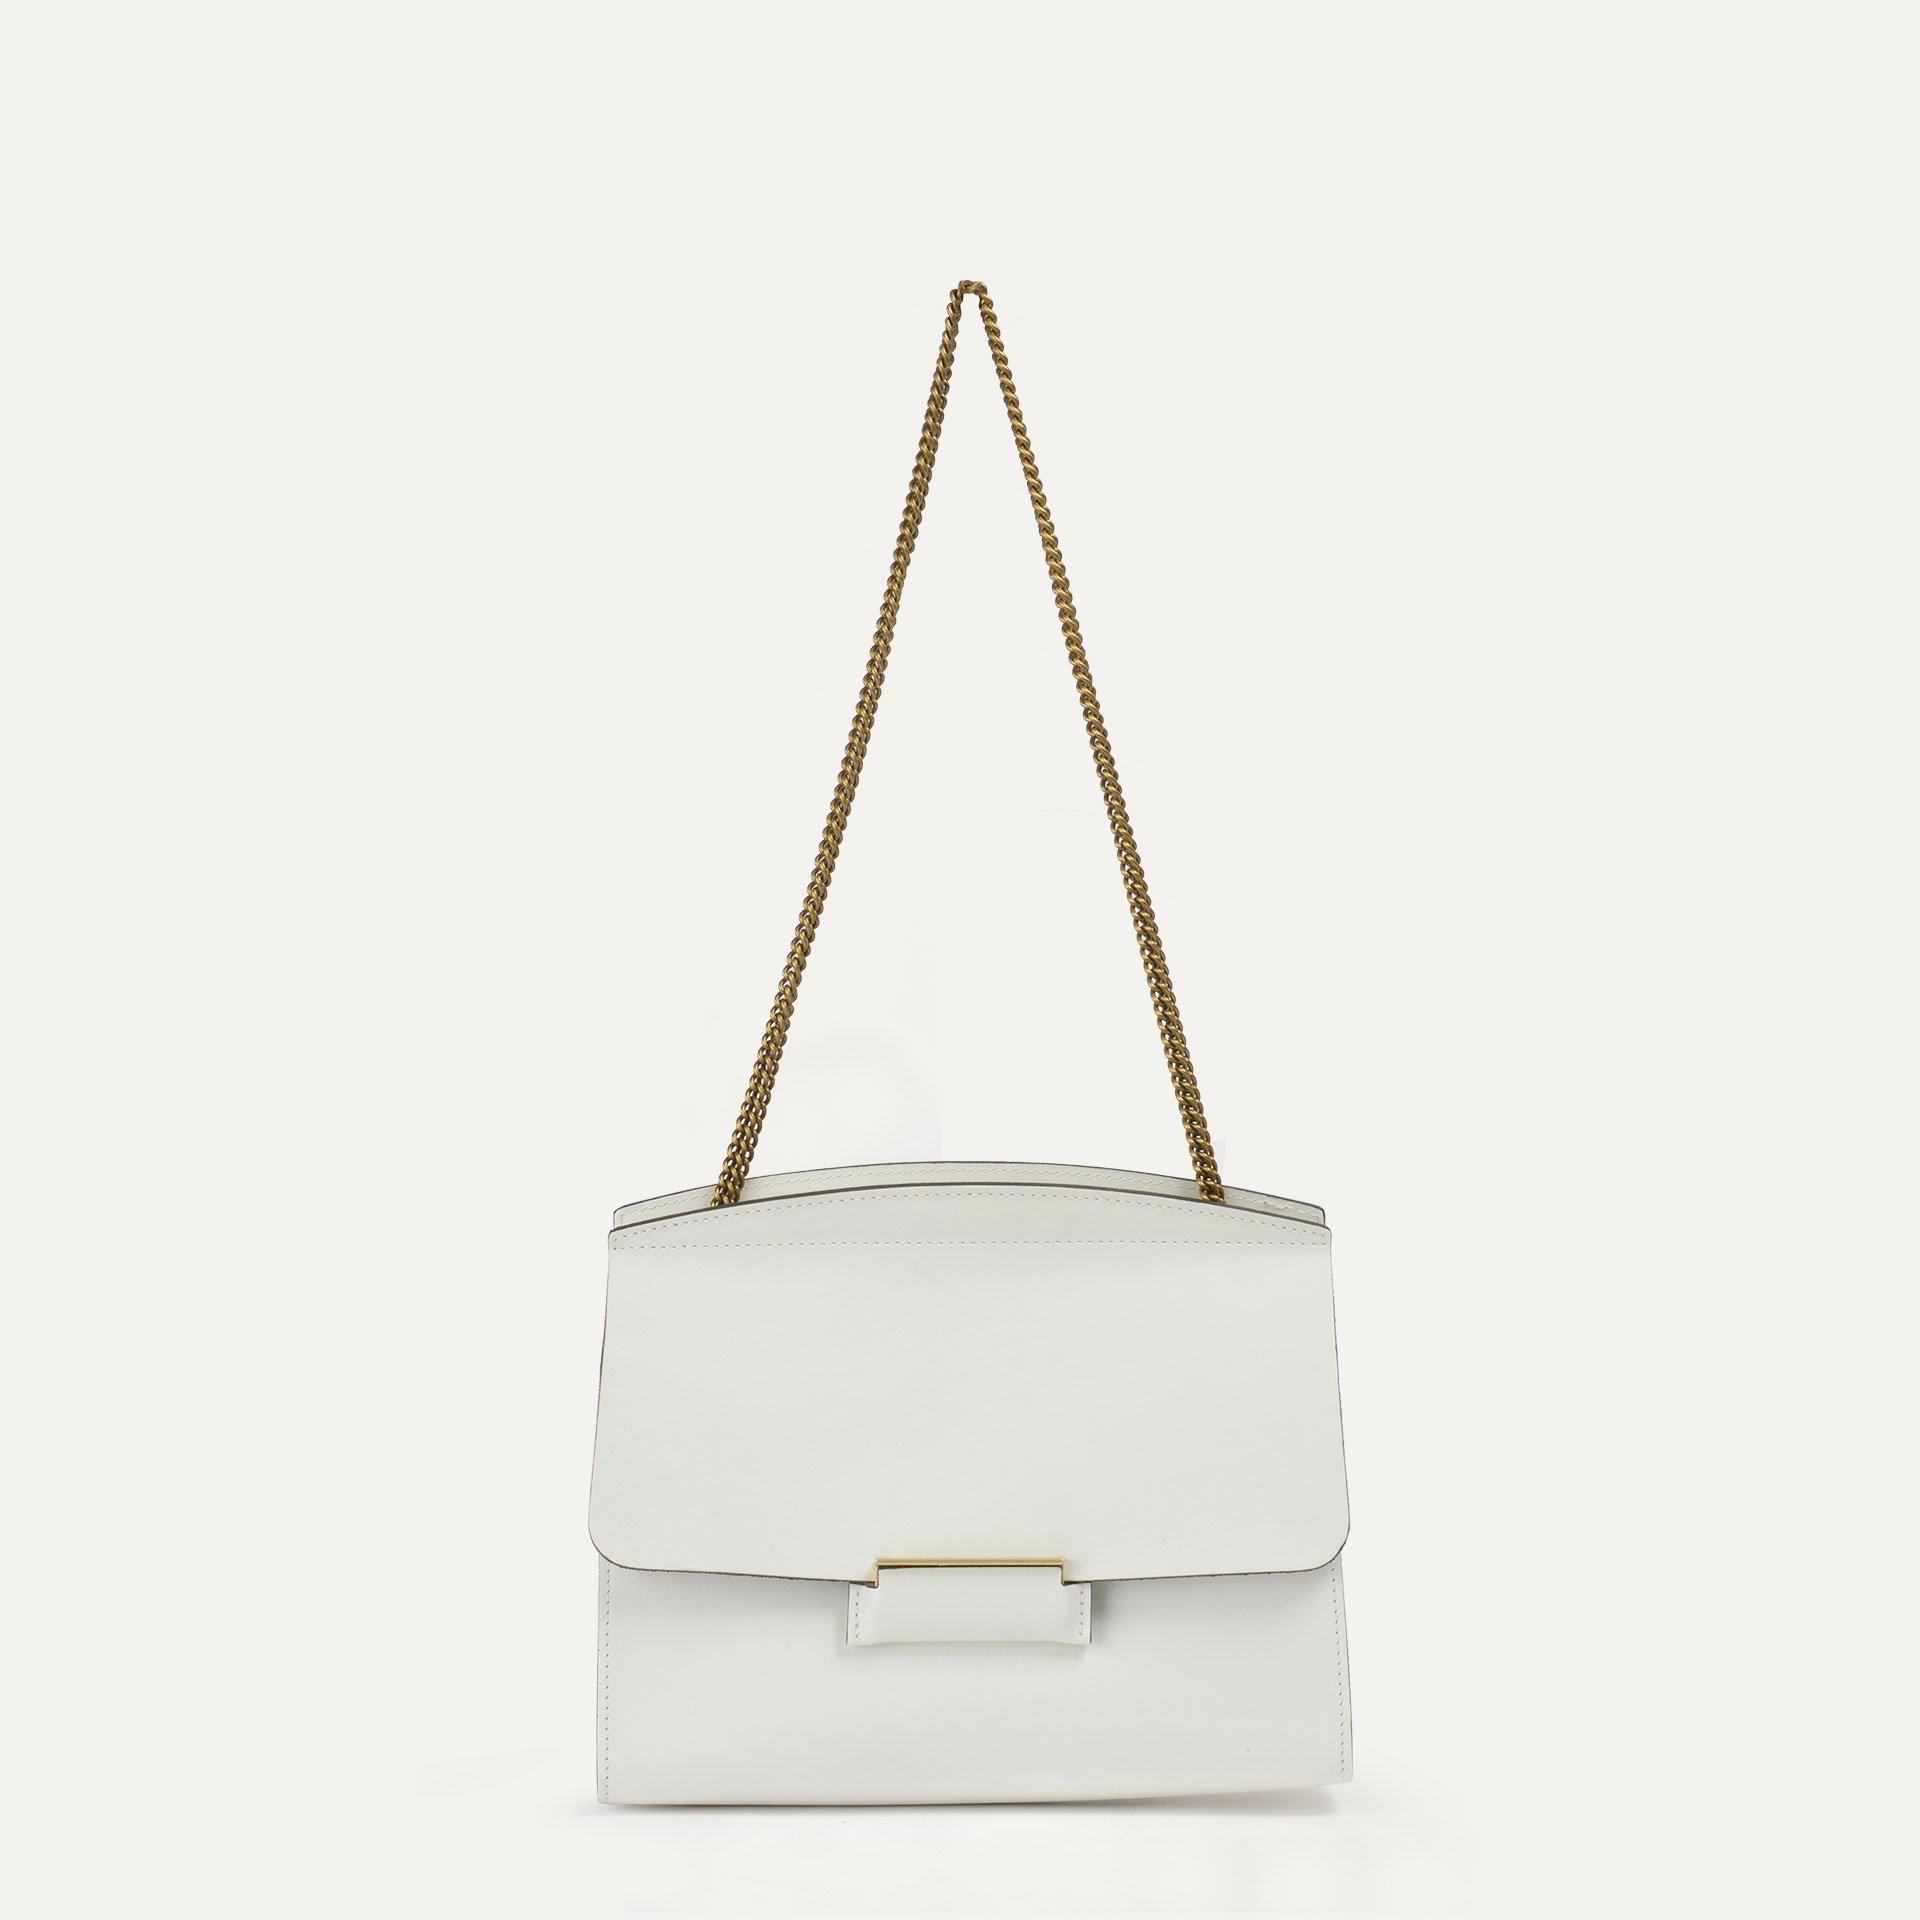 Origami S clutch bag - White (image n°1)